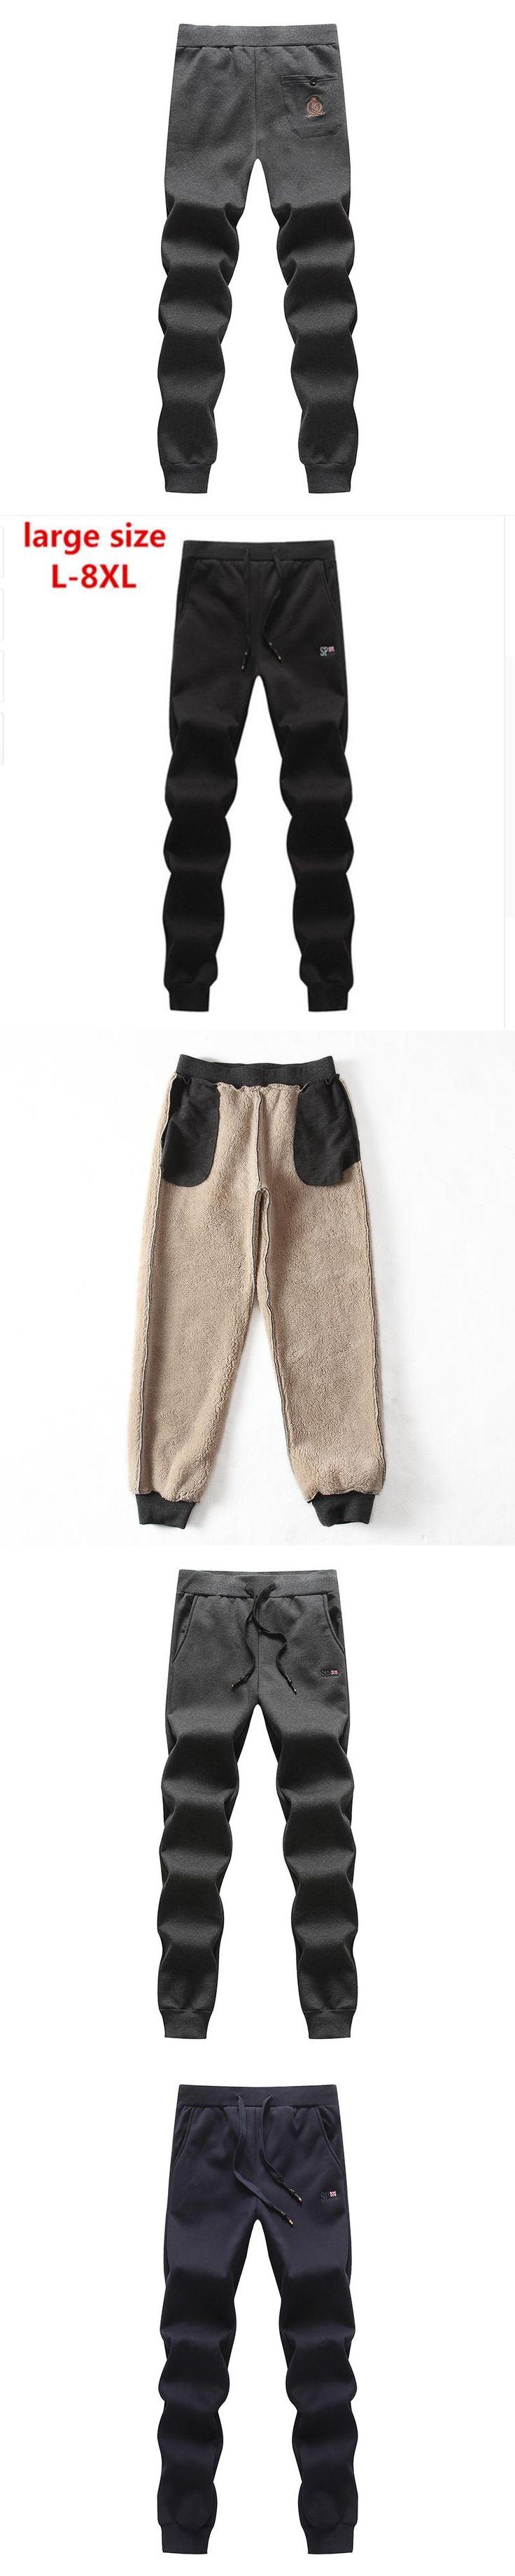 2017new large size 8XL 7XL 6XL Fleece Thick Pants Men Outside Winter Pants Men Fleece Warm Mens Fleece Pants Heavyweight Zipper